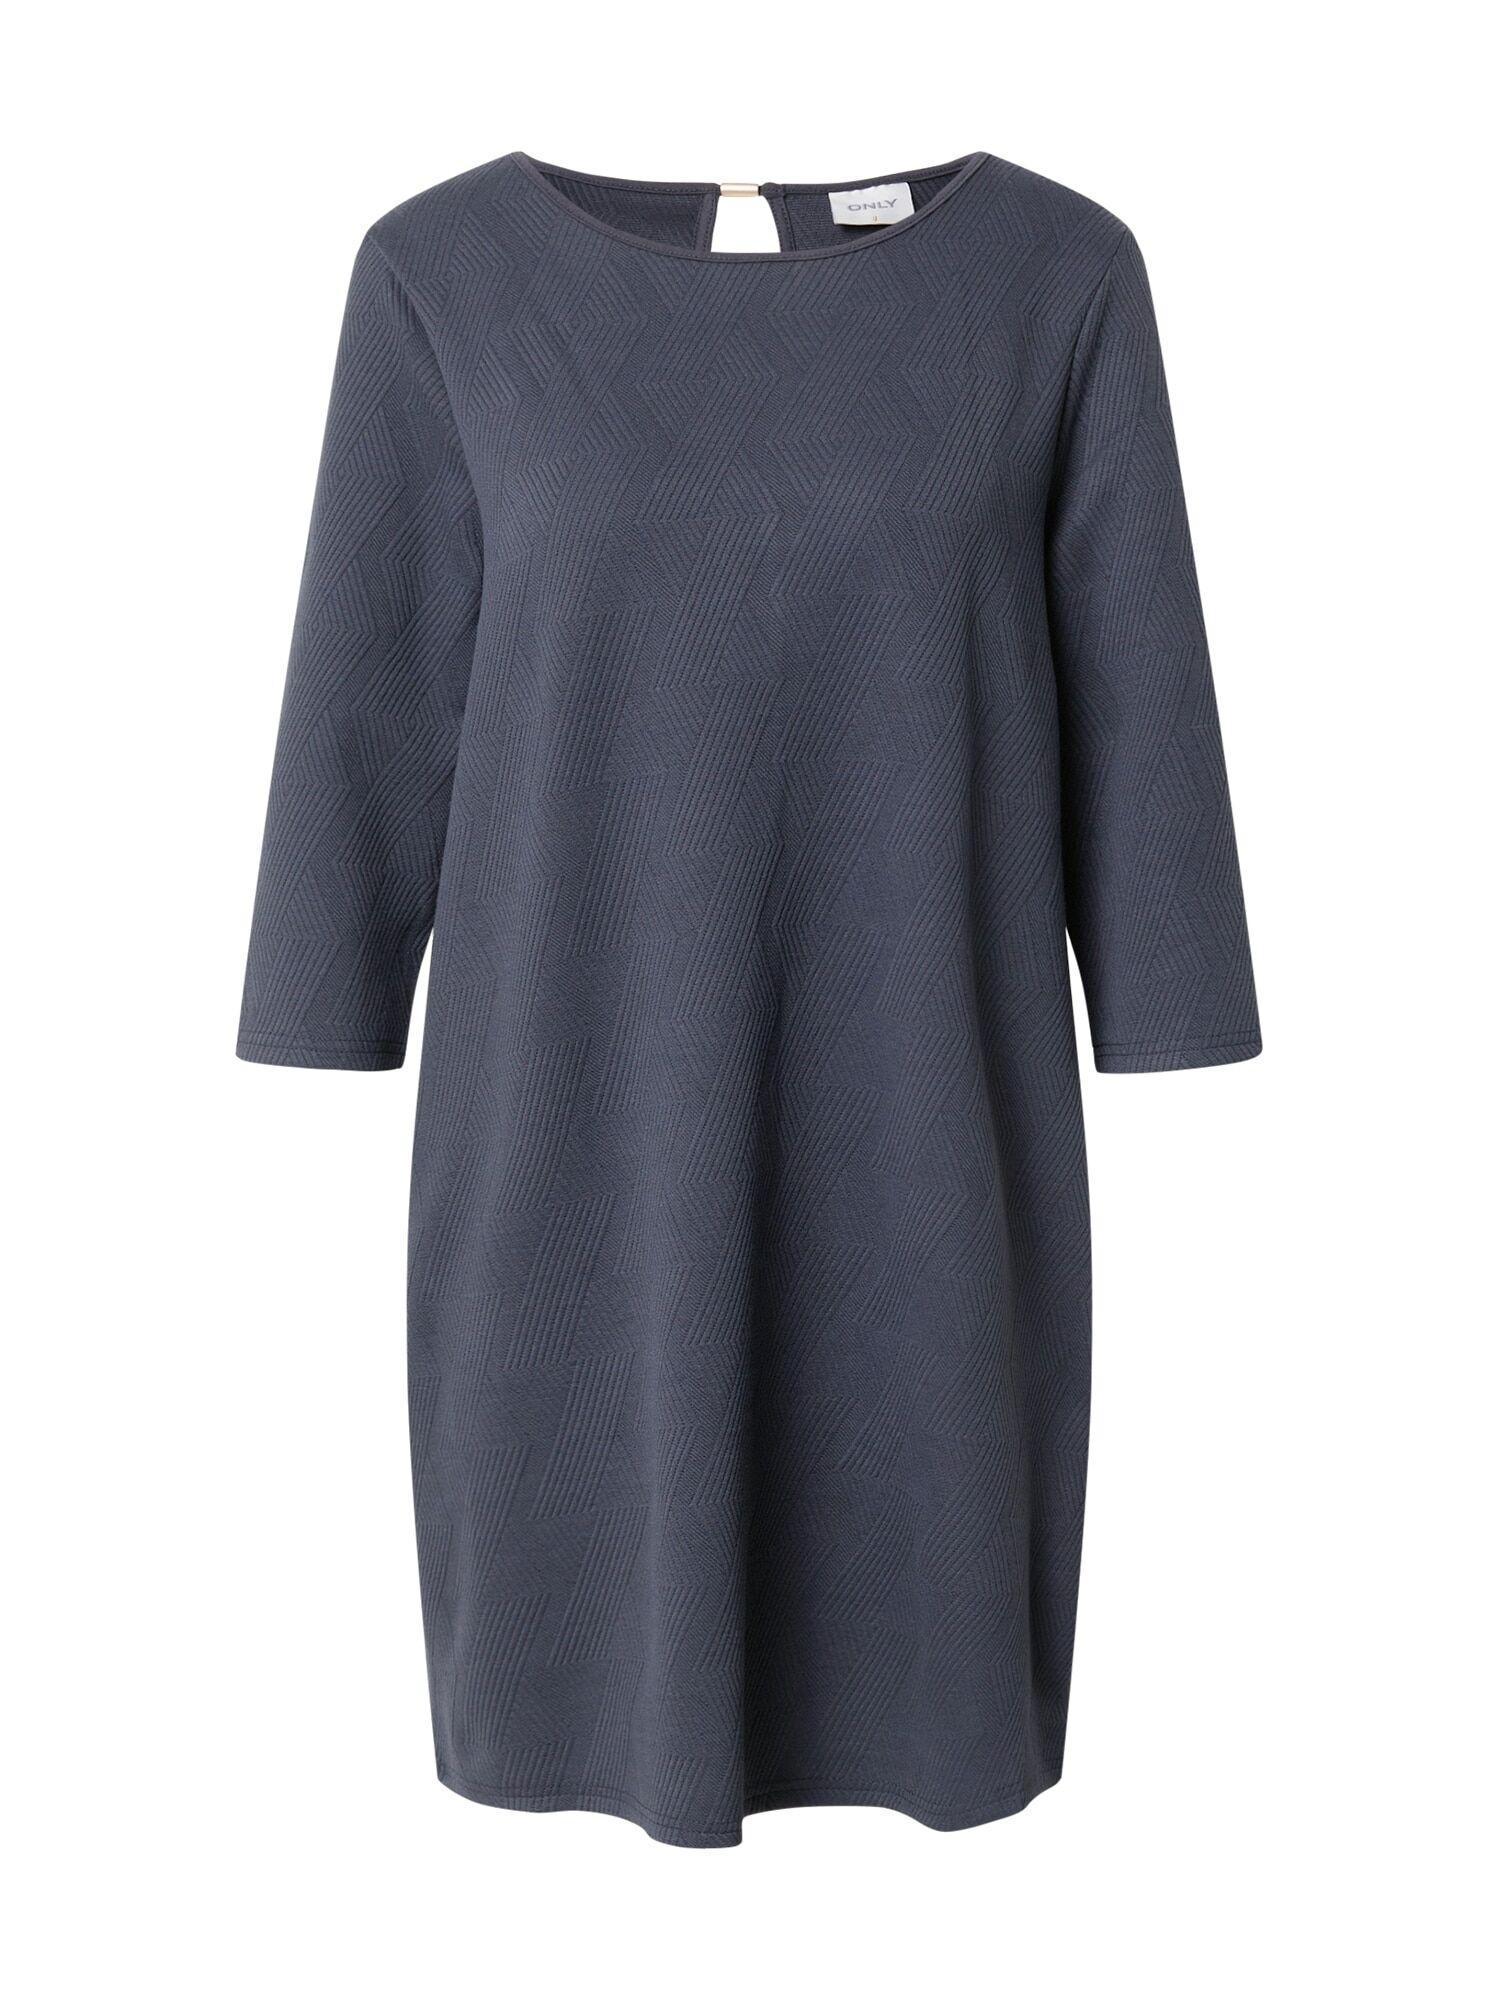 ONLY Robe 'SOJA'  - Bleu - Taille: M - female